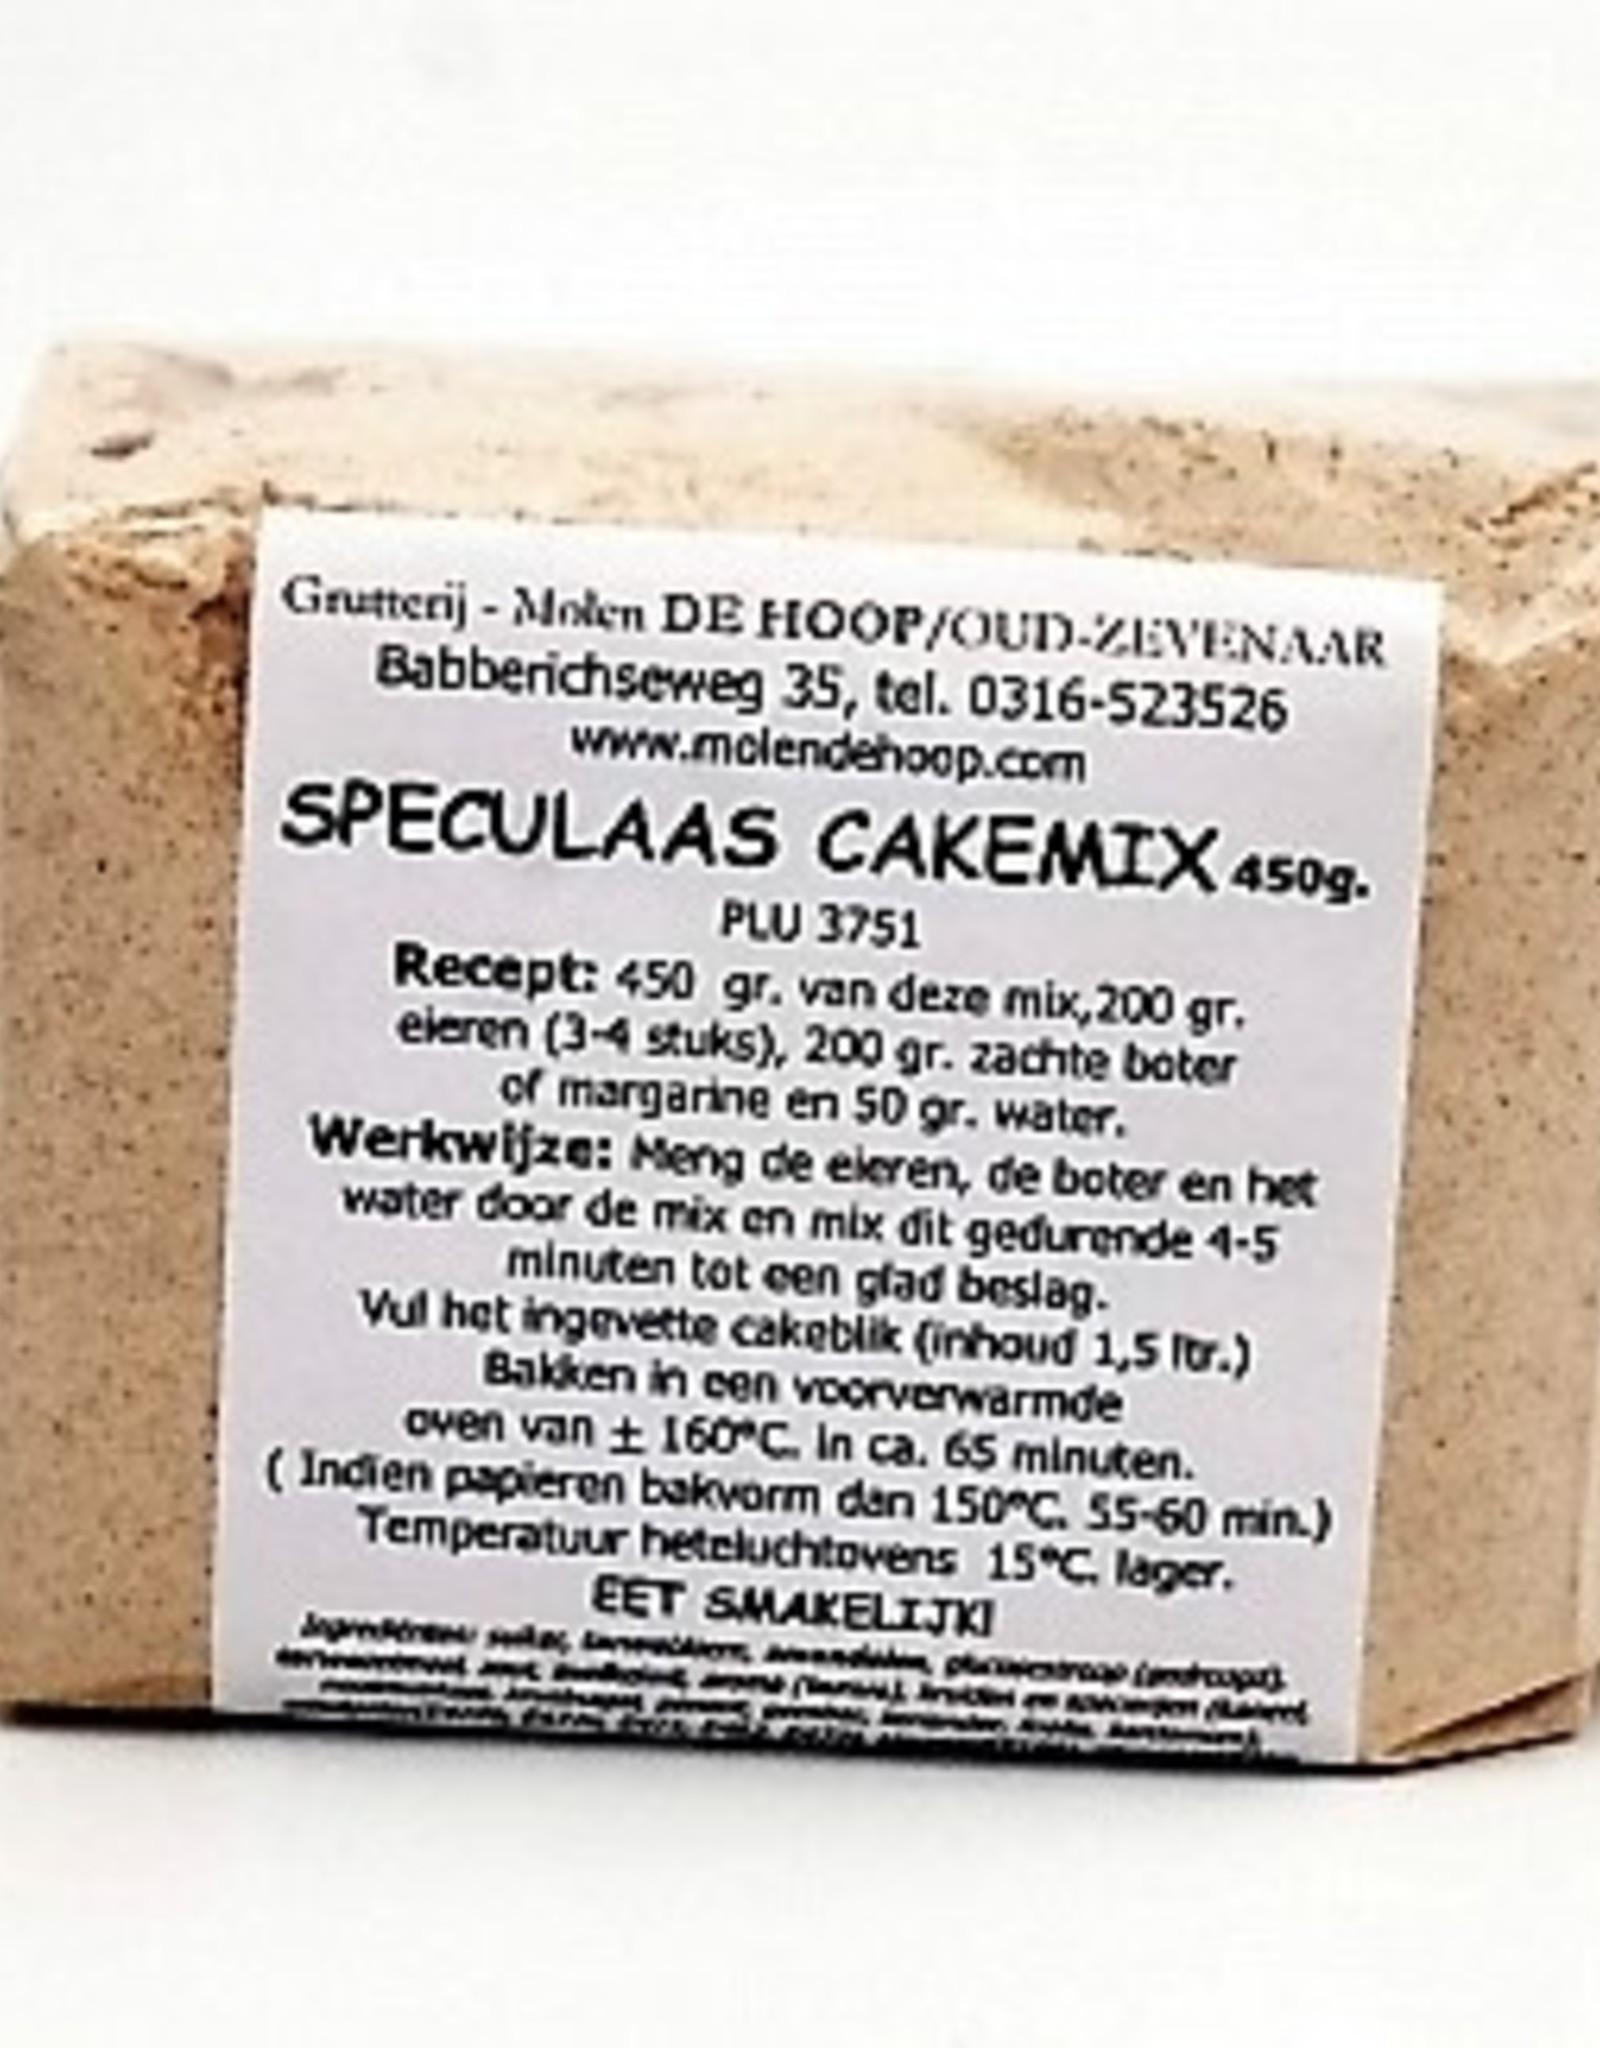 Speculaas Cakemix